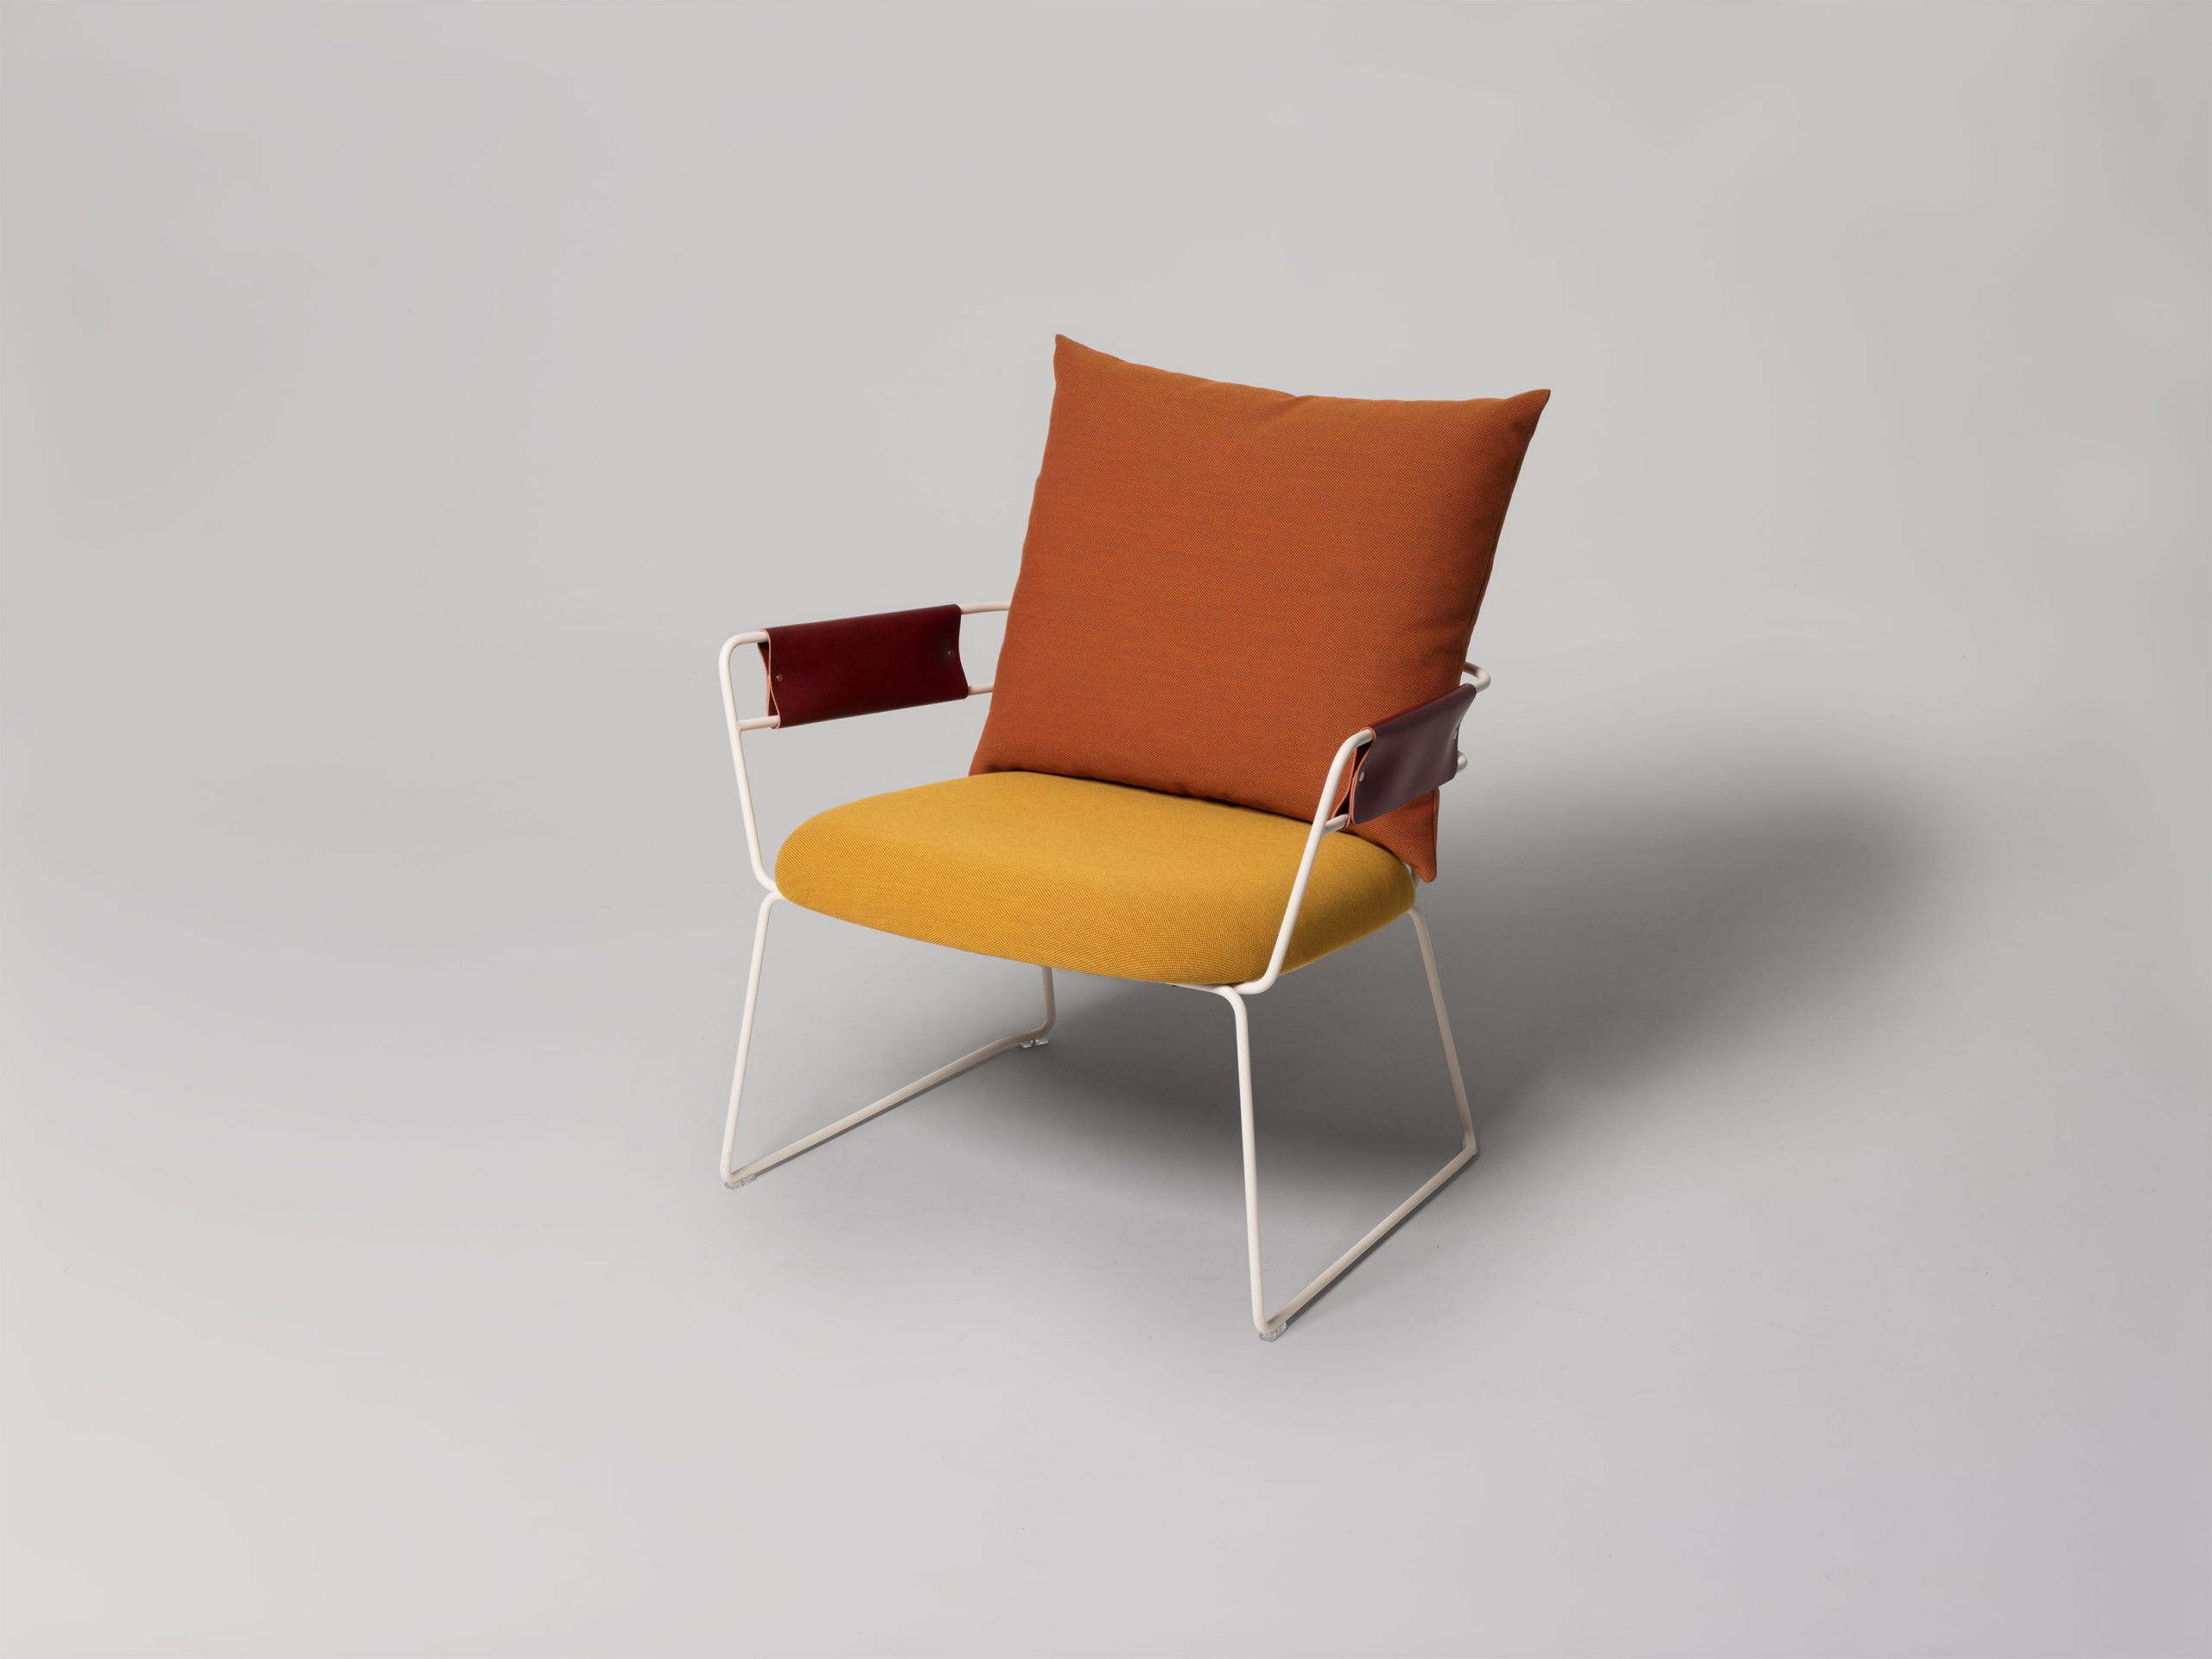 https://www.minustio.se/wp-content/uploads/2021/03/Darling-Lounge-Sled-Base-Front-1-scaled.jpg